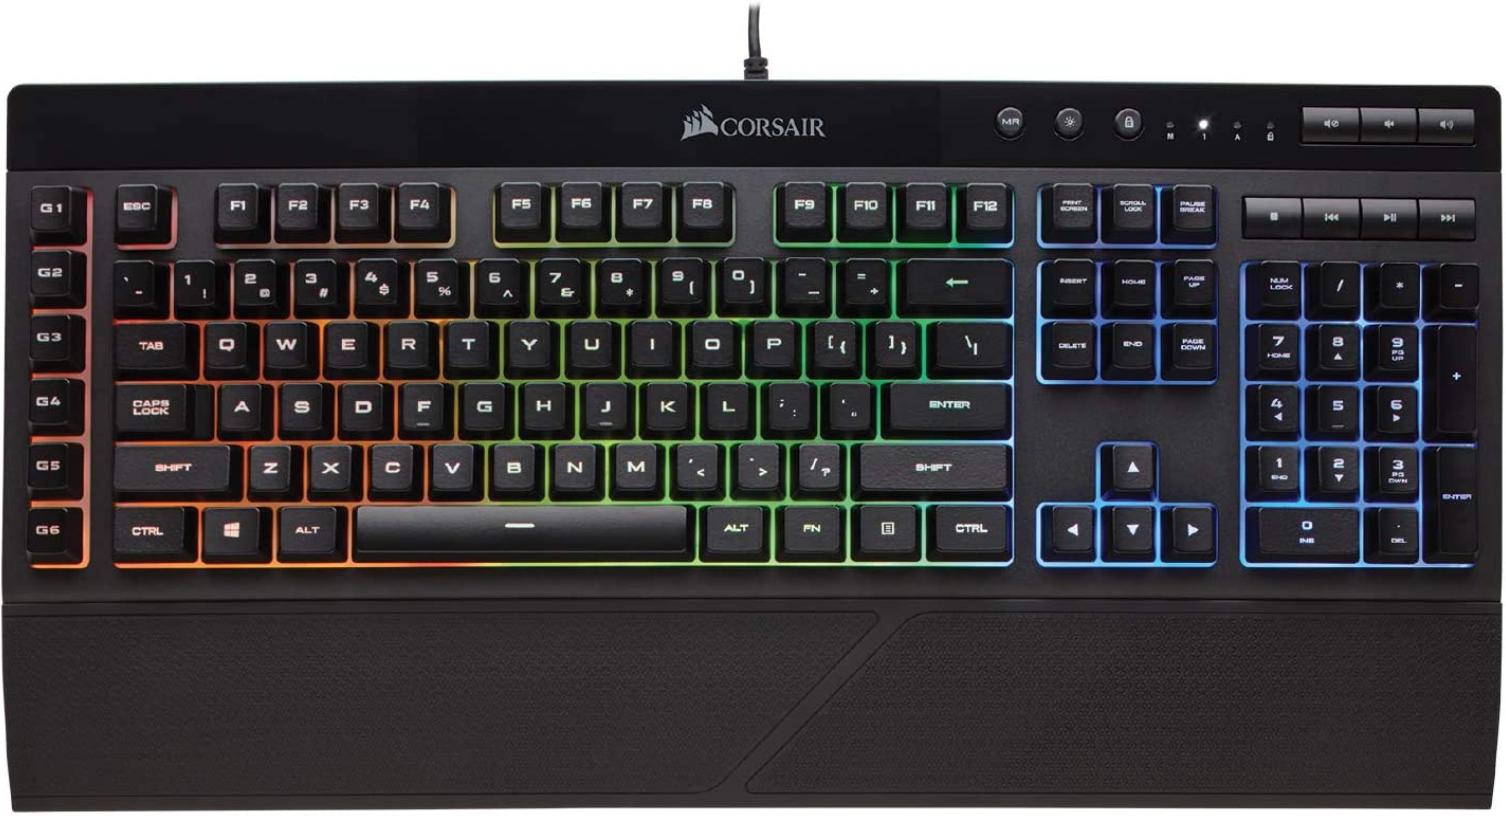 Corsair K55 Keyboard  with RGB lighting under keys.